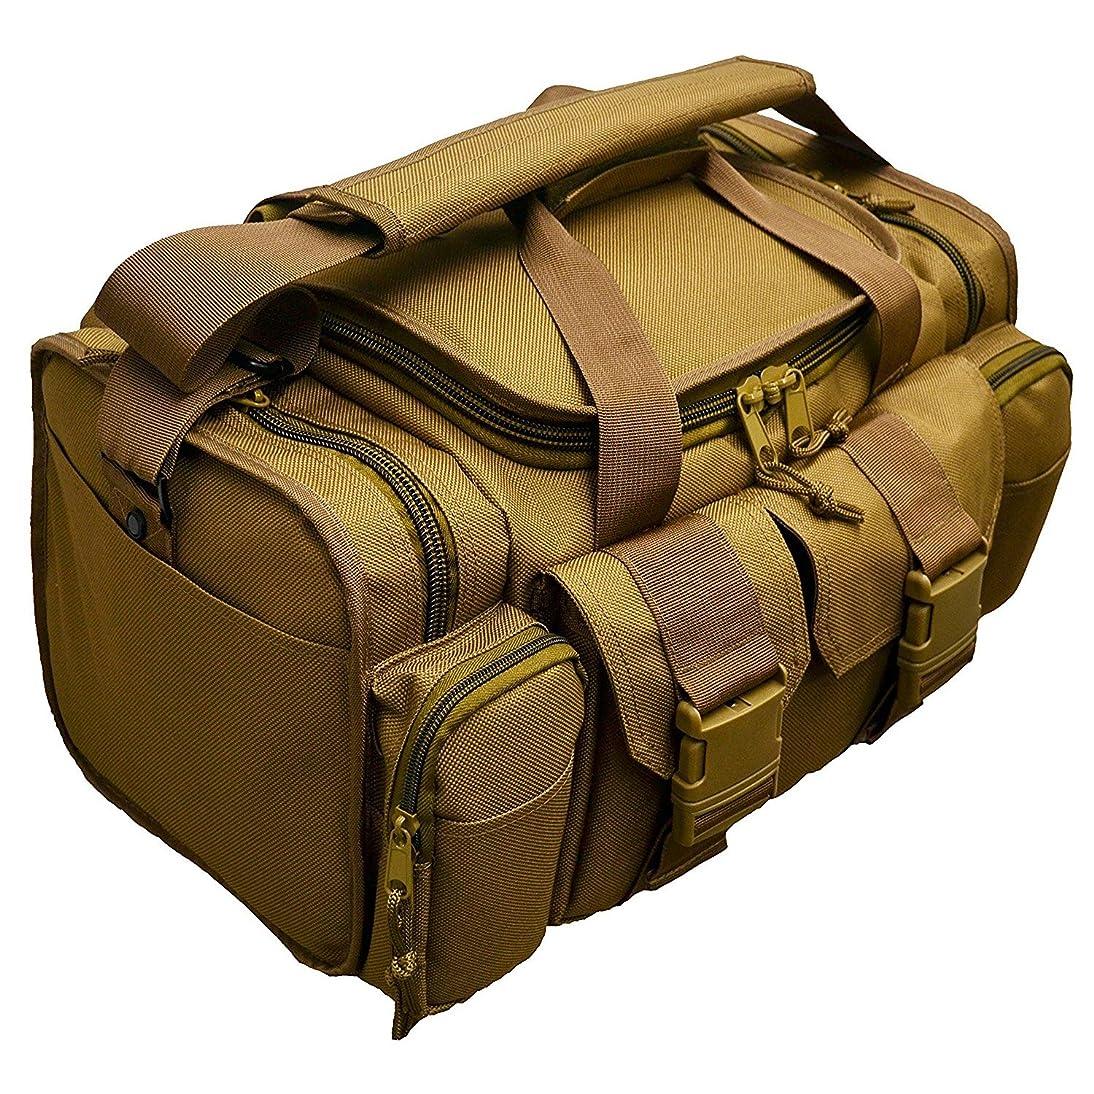 Johnson Tactical Shooting Gun Pistol Range Gear Bag lrgv007487902438